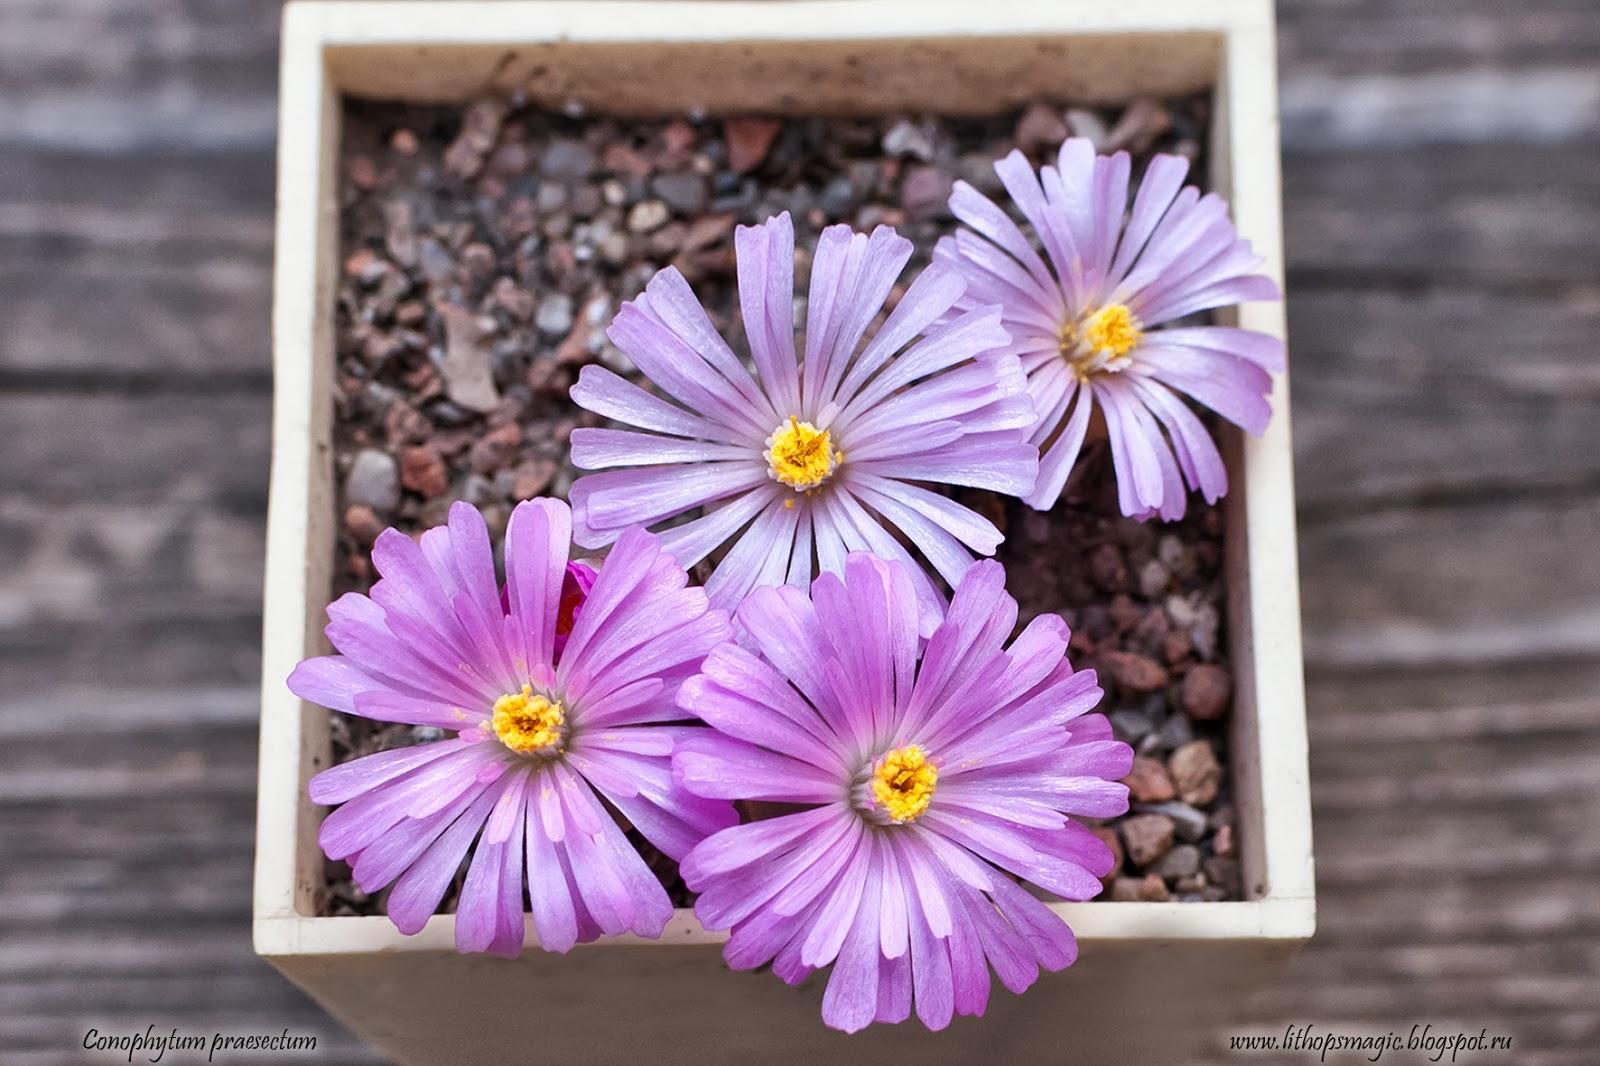 Lithops Magic Conophytum Praesectum Flowers